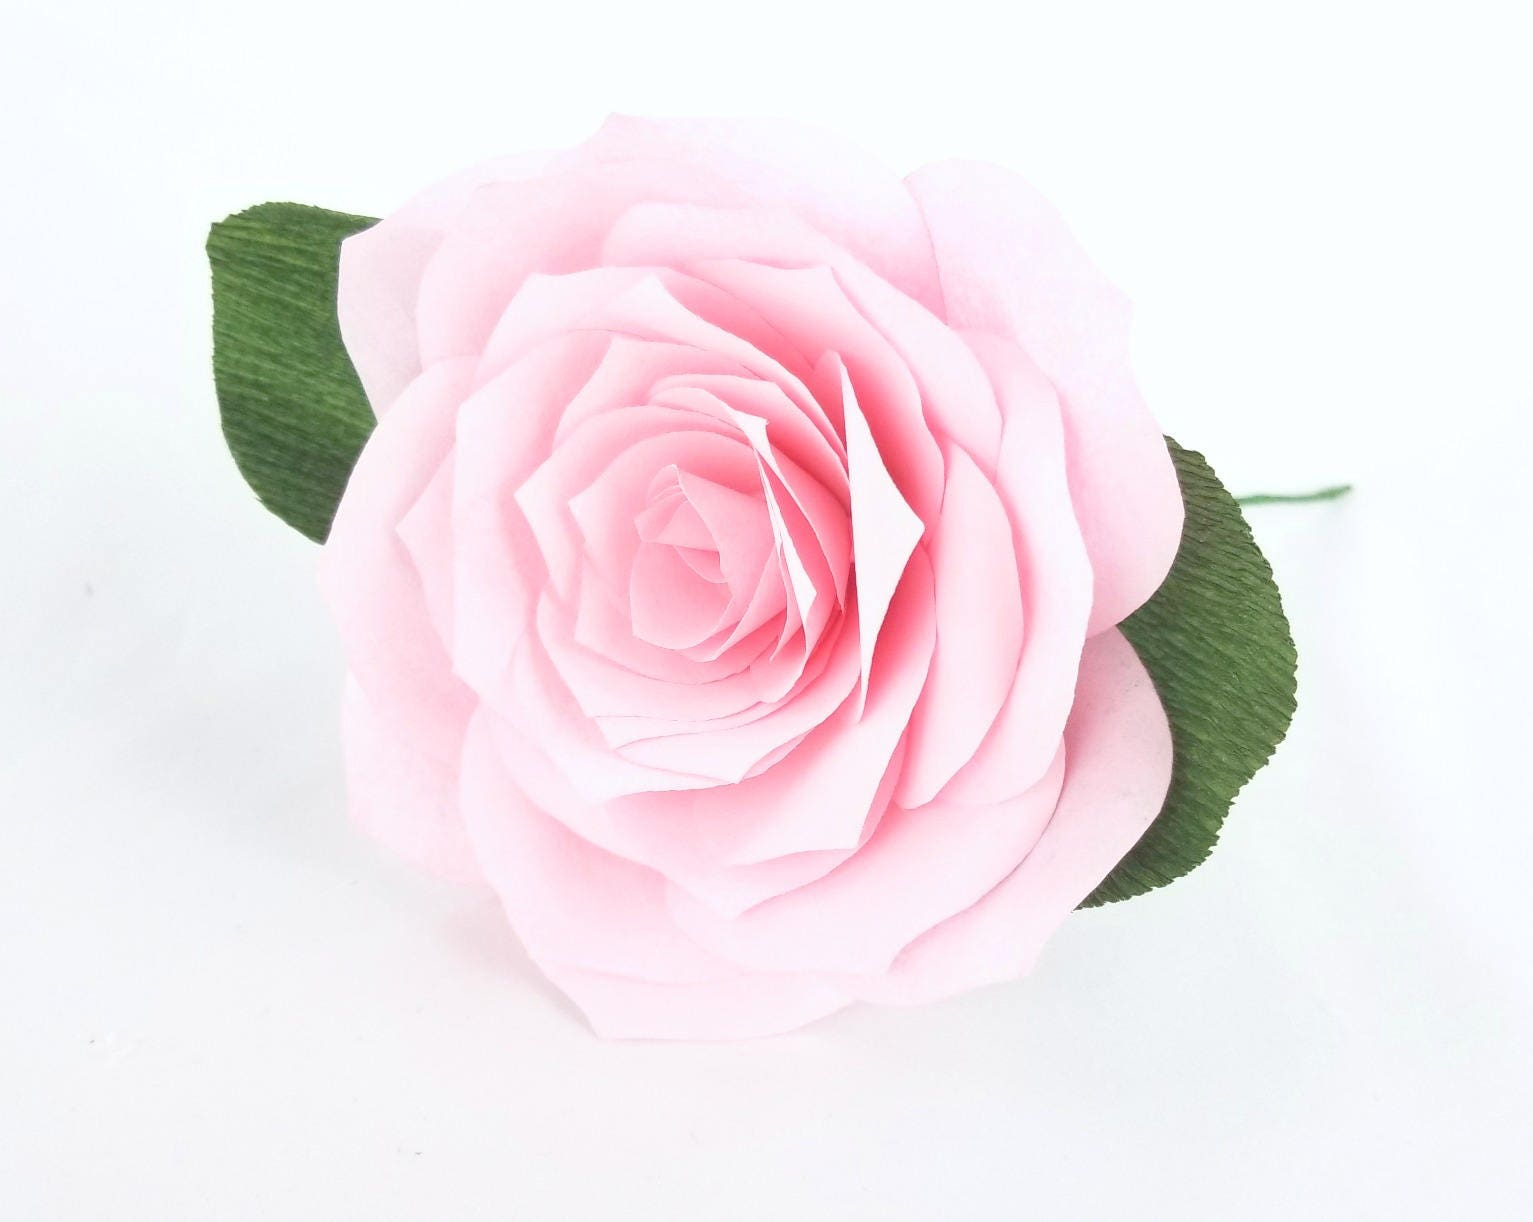 Paper roses cake flowers coffee filter roses paper flowers zoom izmirmasajfo